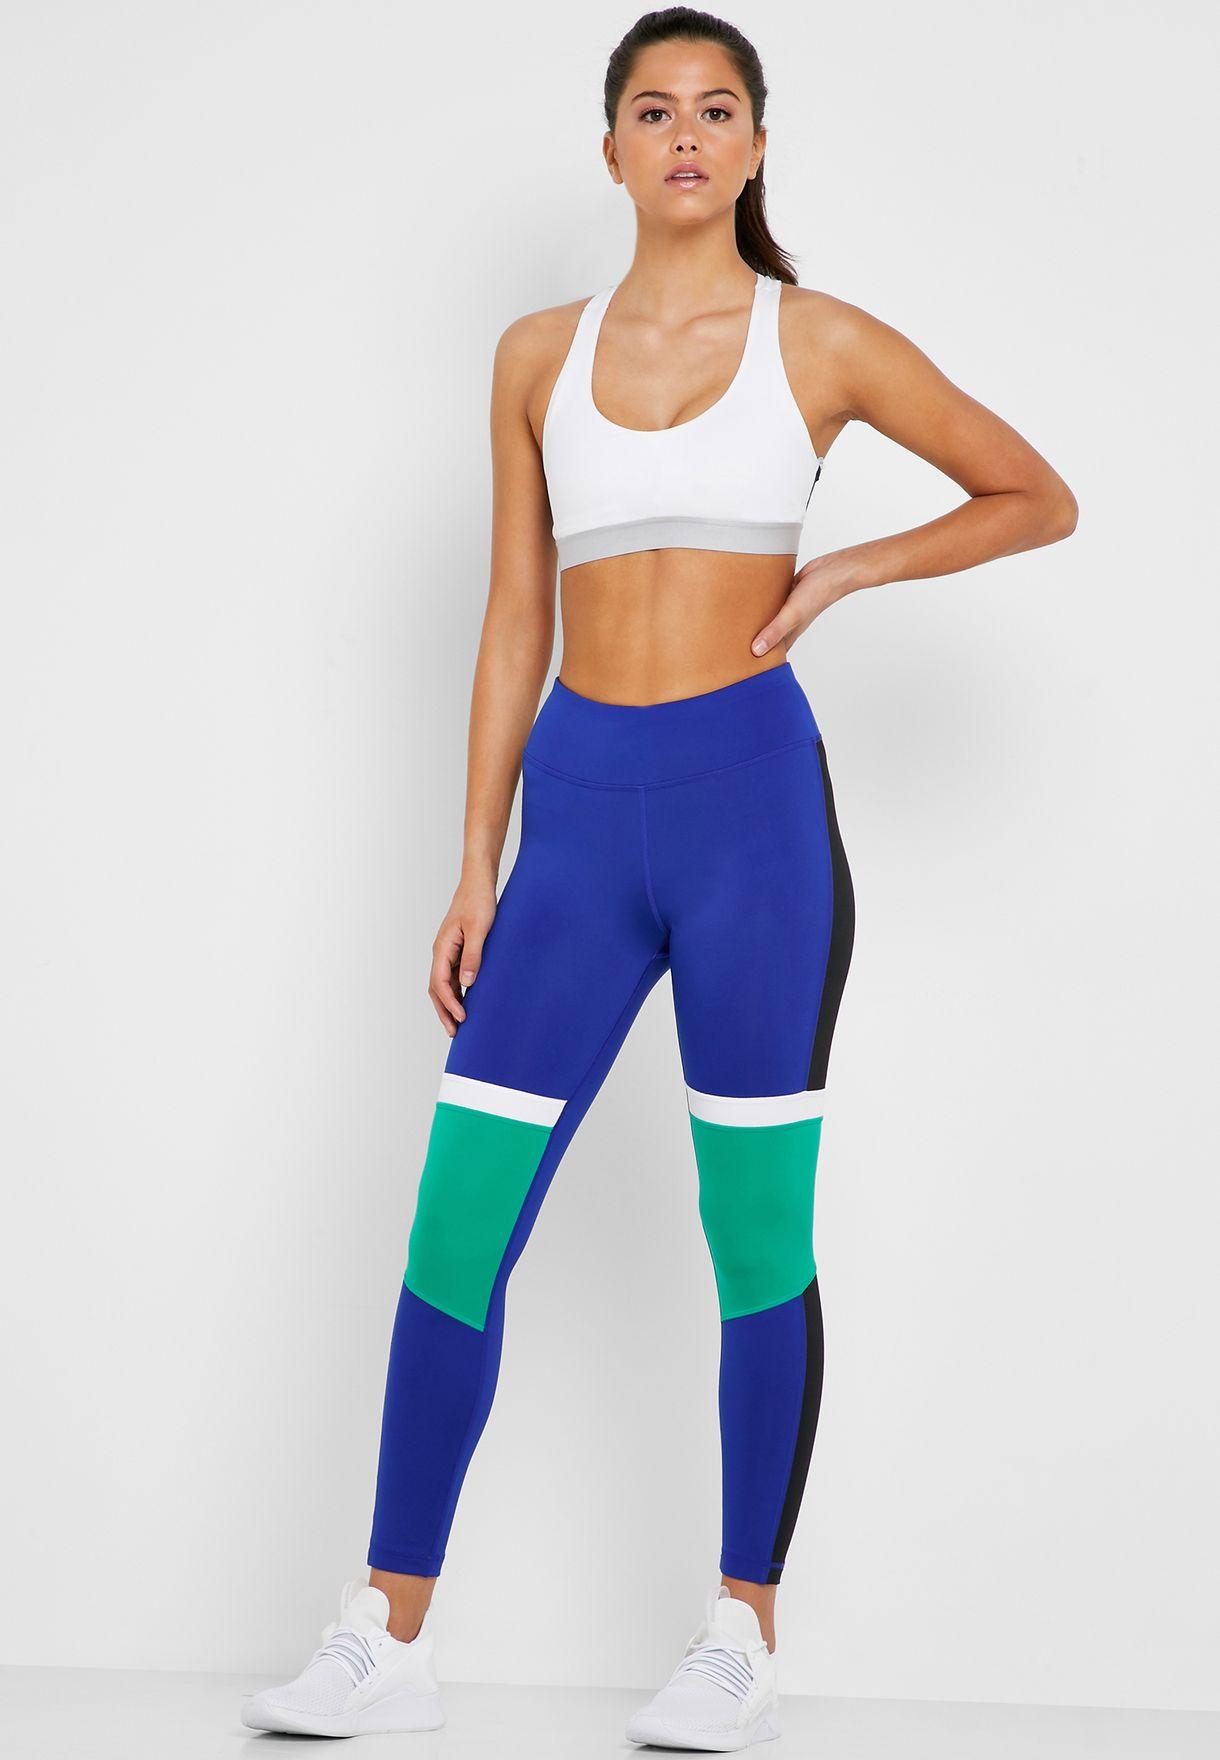 Workout Ready Paneled Leggings